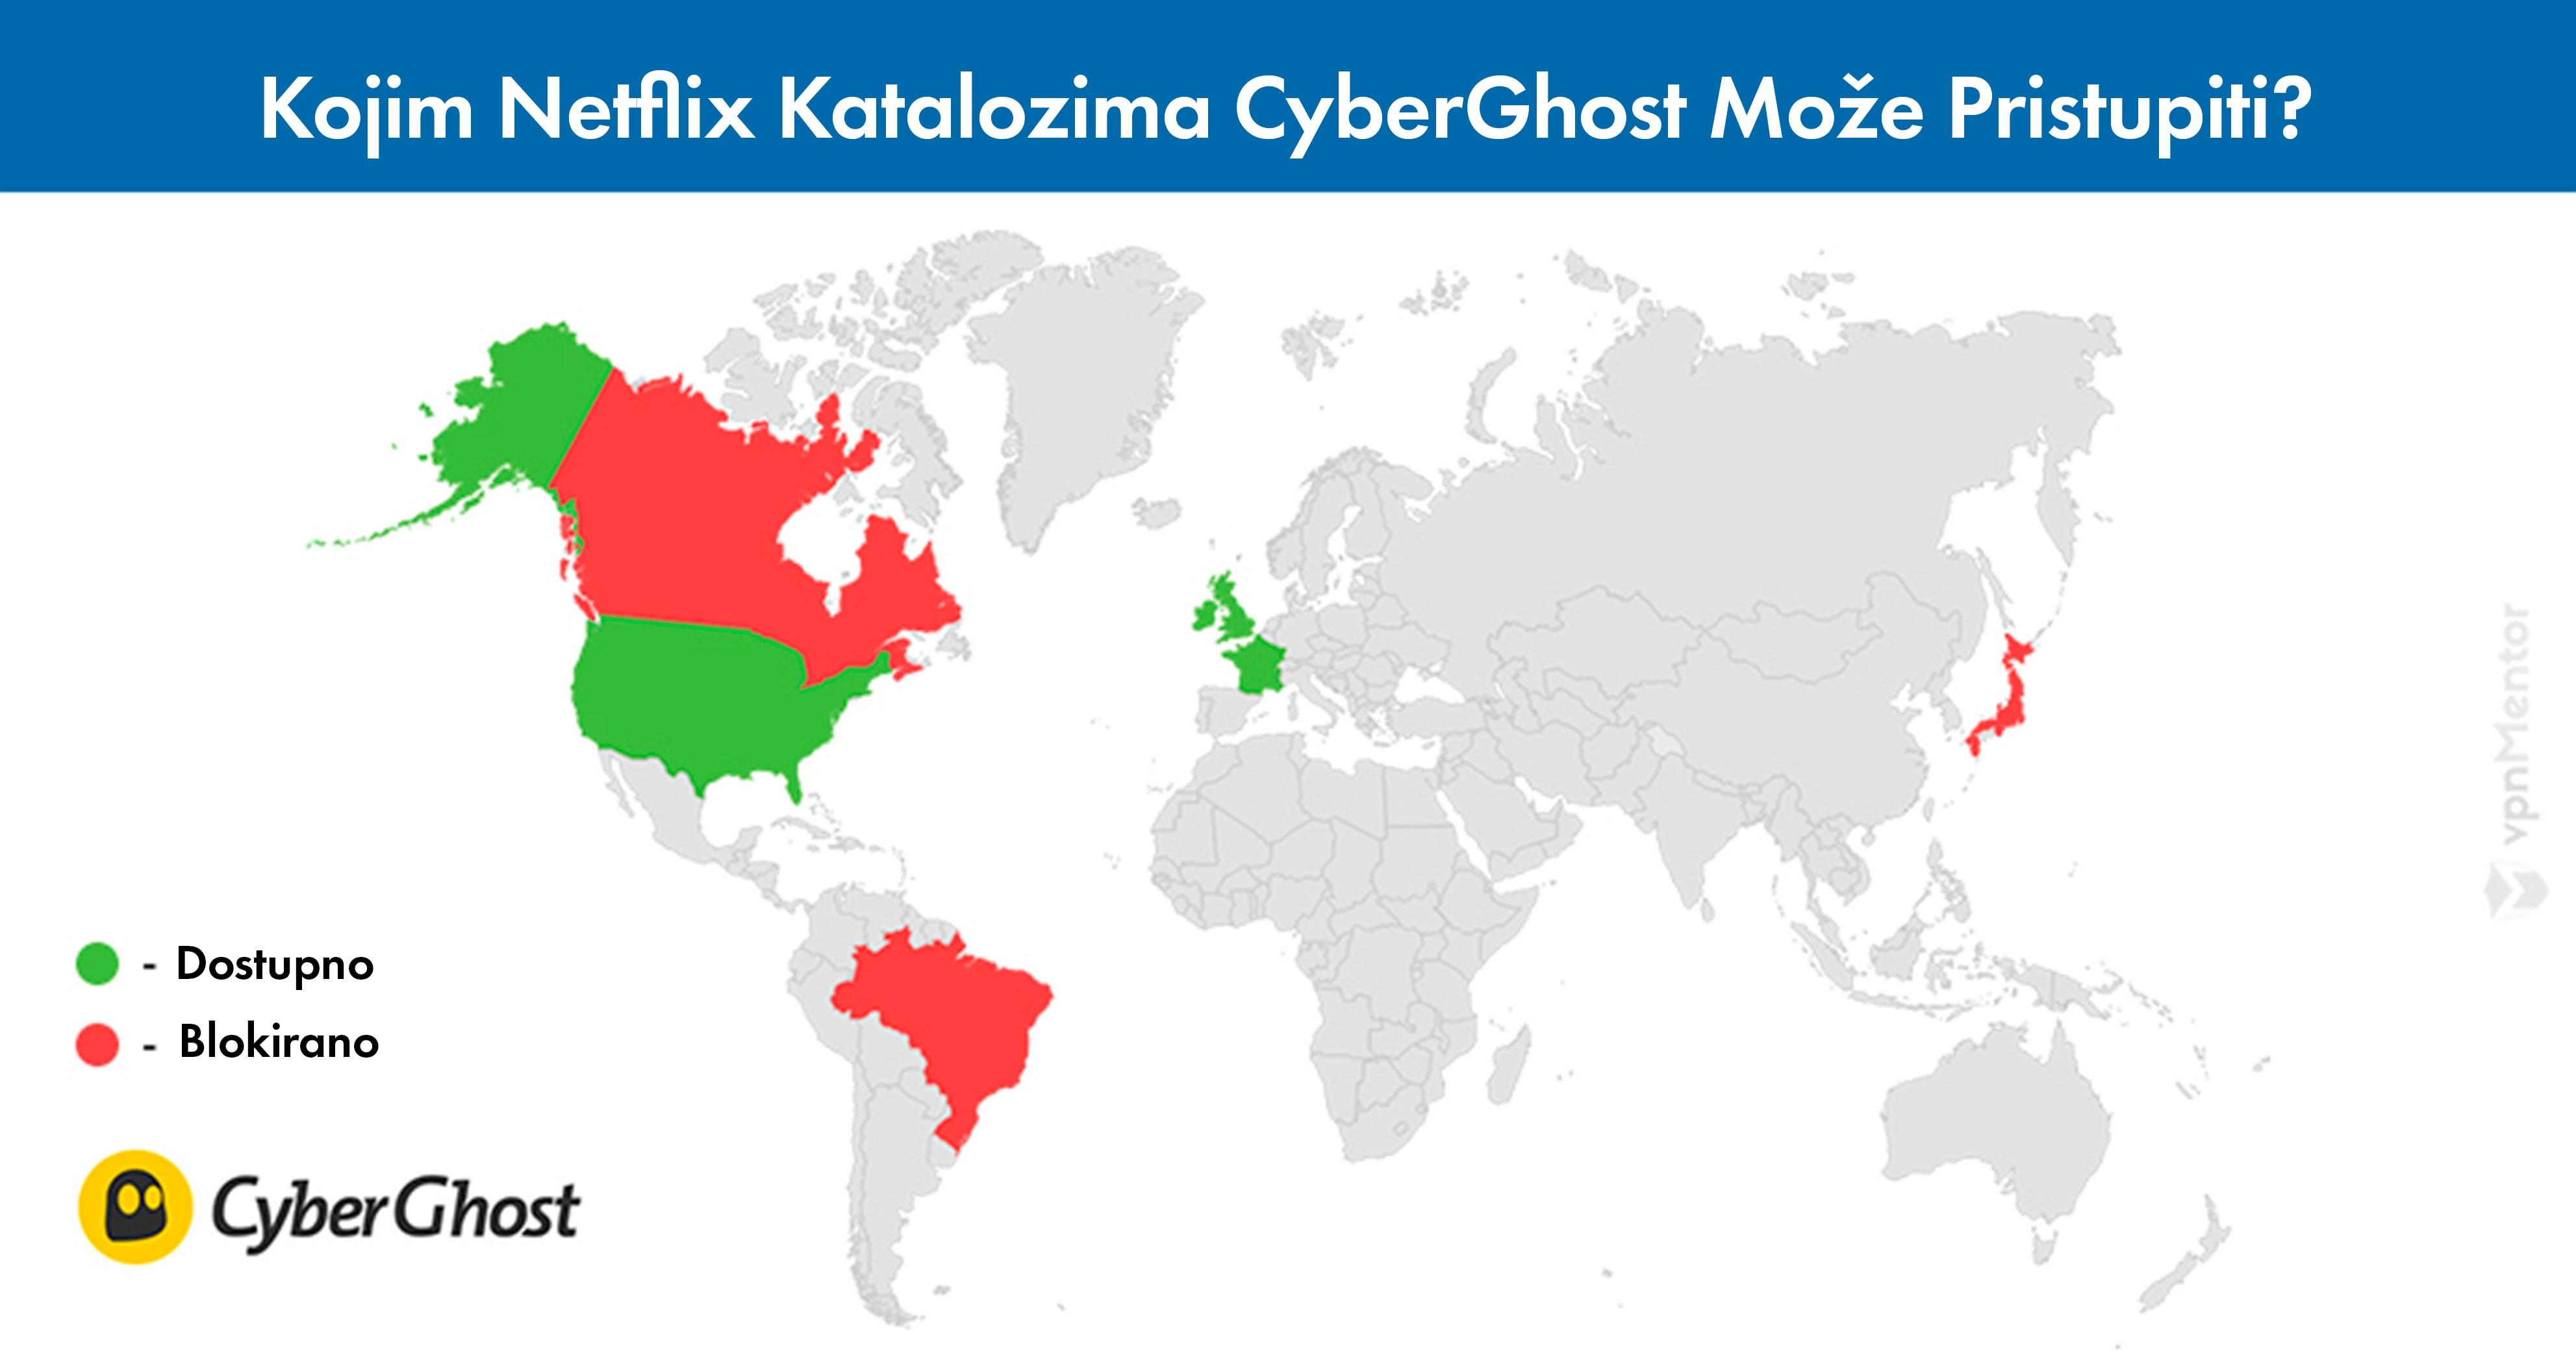 cyberghost pristup netflix katalozima